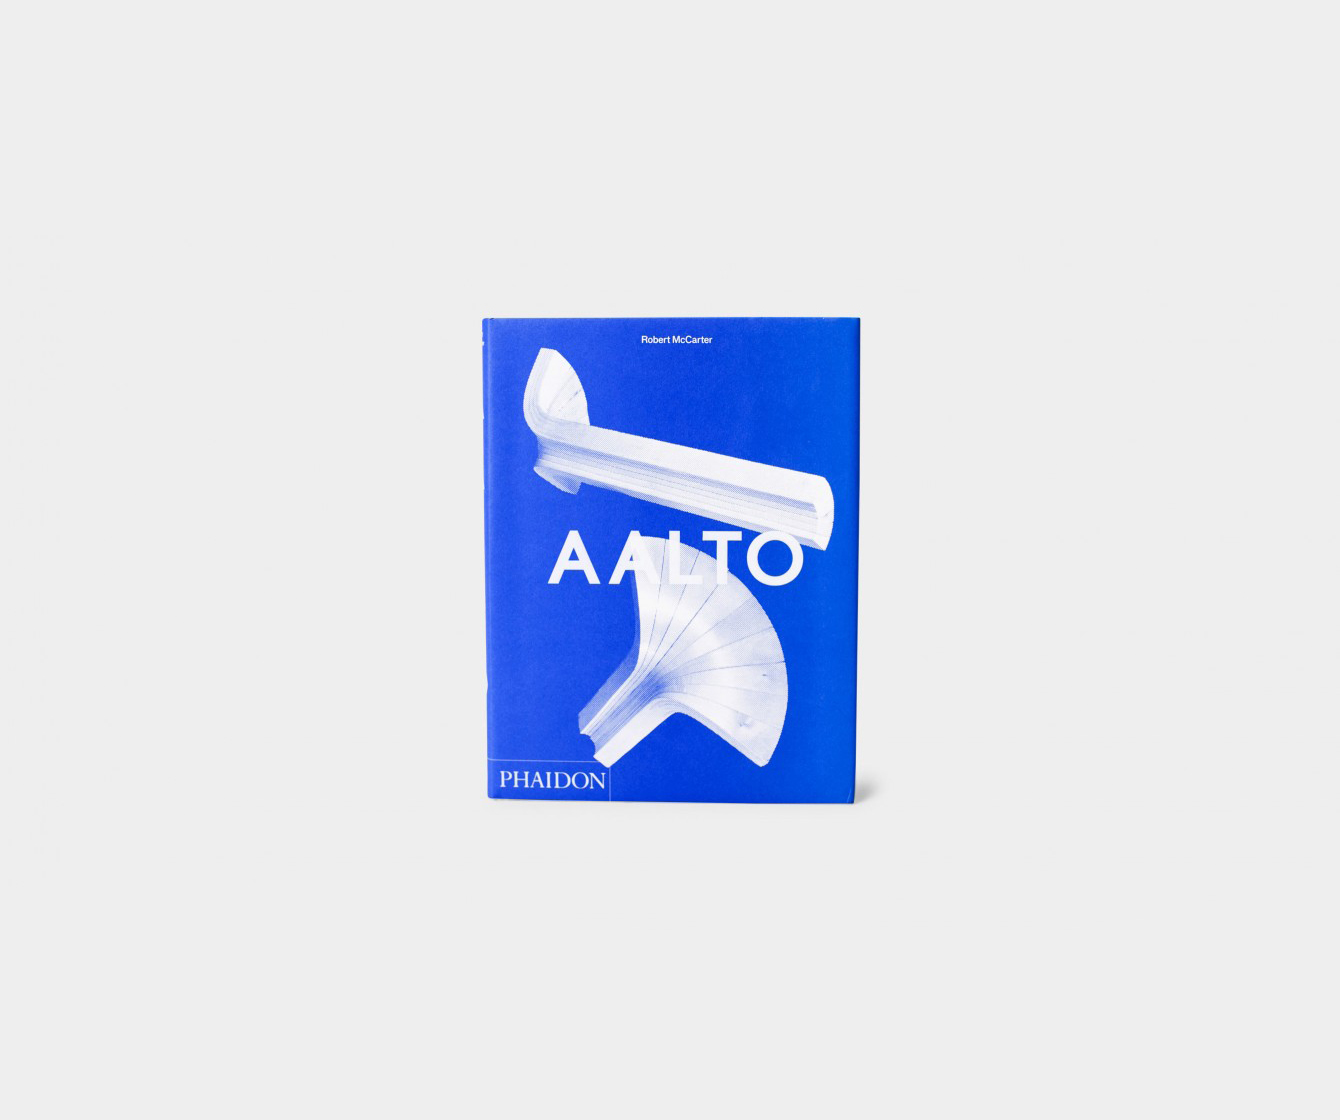 AALTO Book: Blue Edition